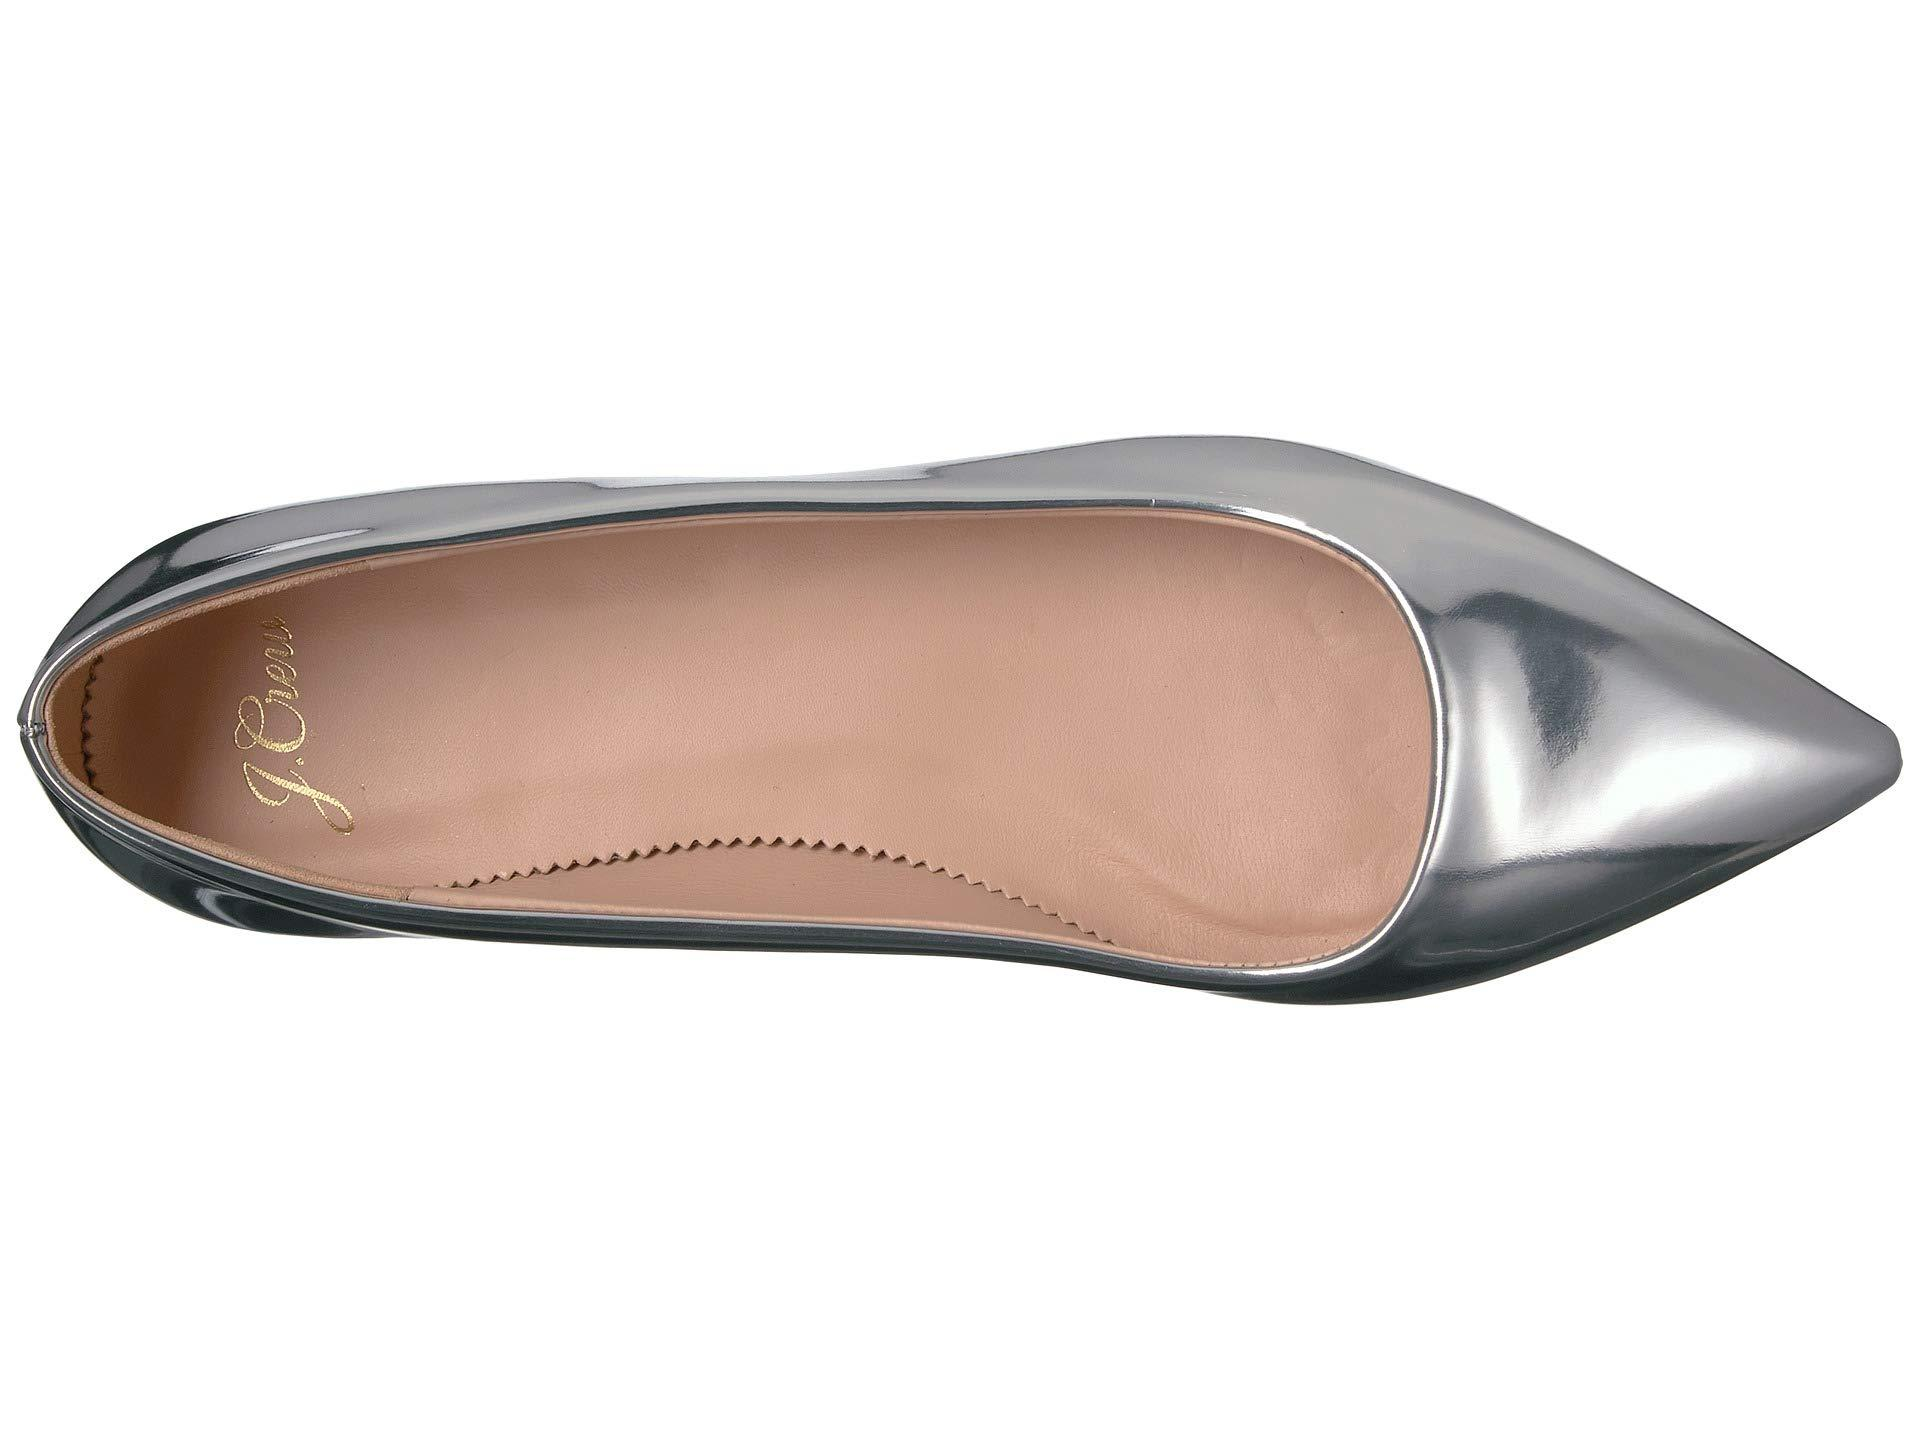 a64cc8dd5b27 Lyst - J.Crew Pointy Toe Flat In Metallic (silver Mirror) Women s ...